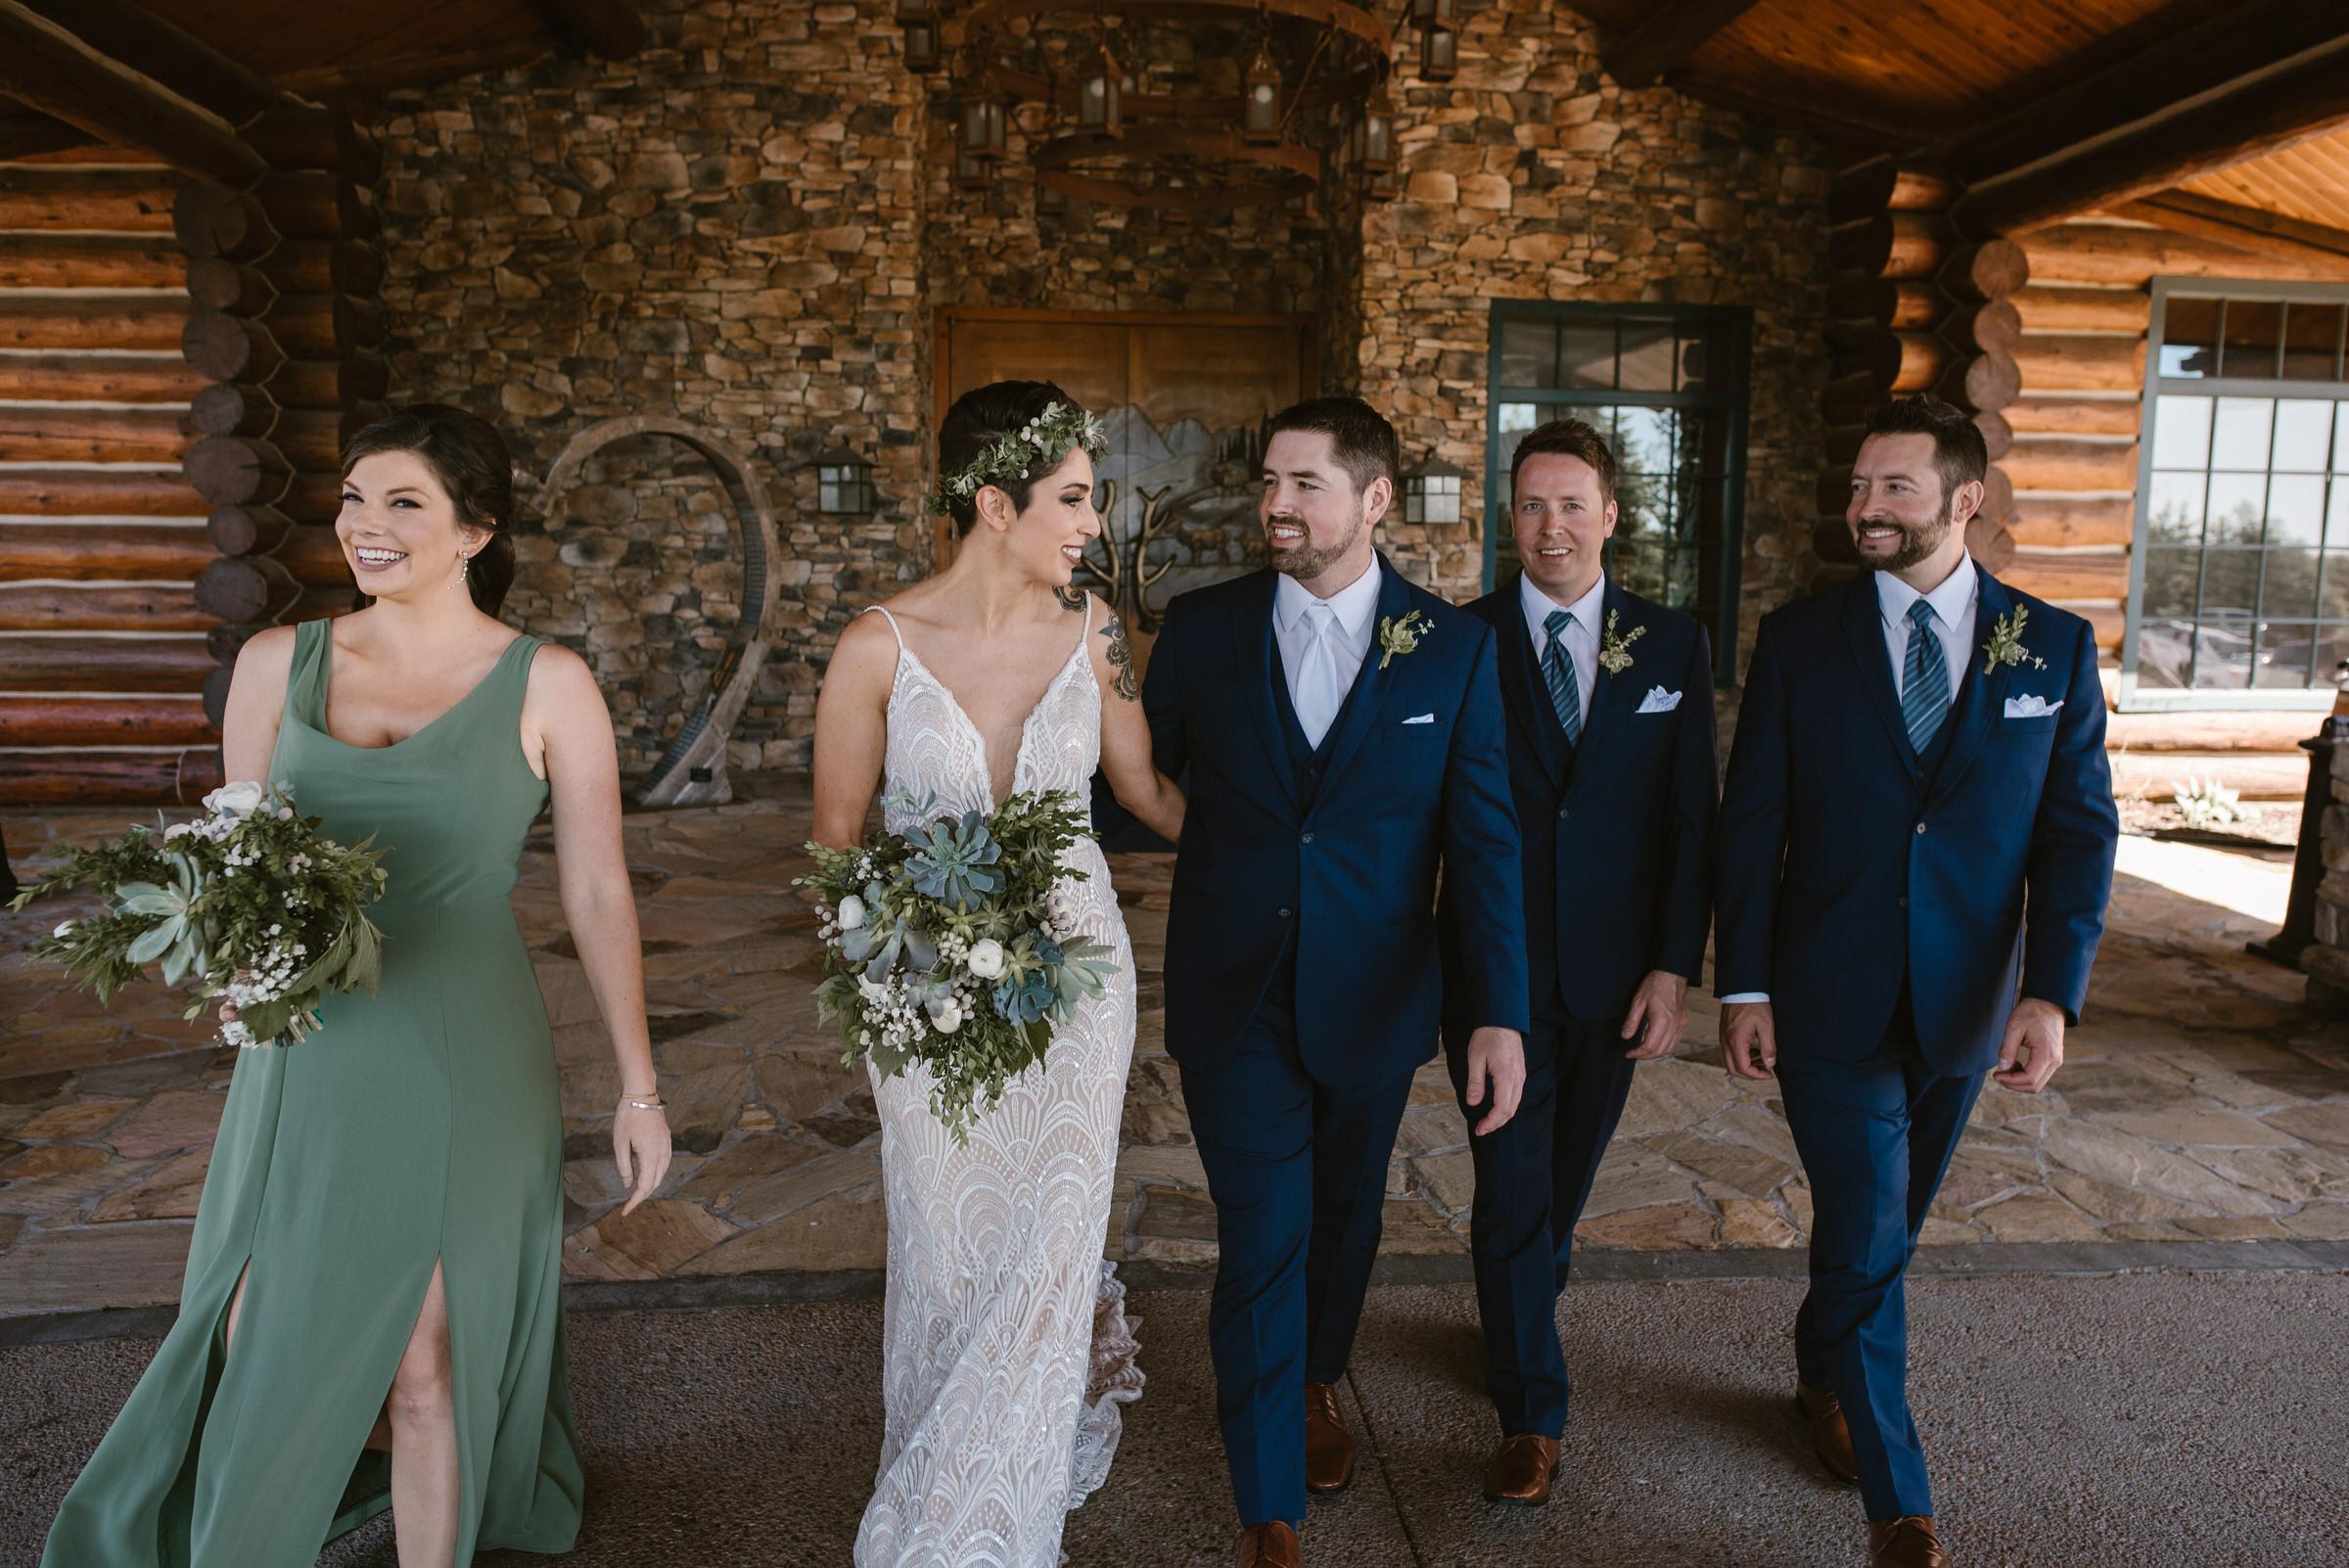 Wilderness-Ridge-Lincoln-Nebraska-Wedding-Kaylie-Sirek-Photography-040.jpg